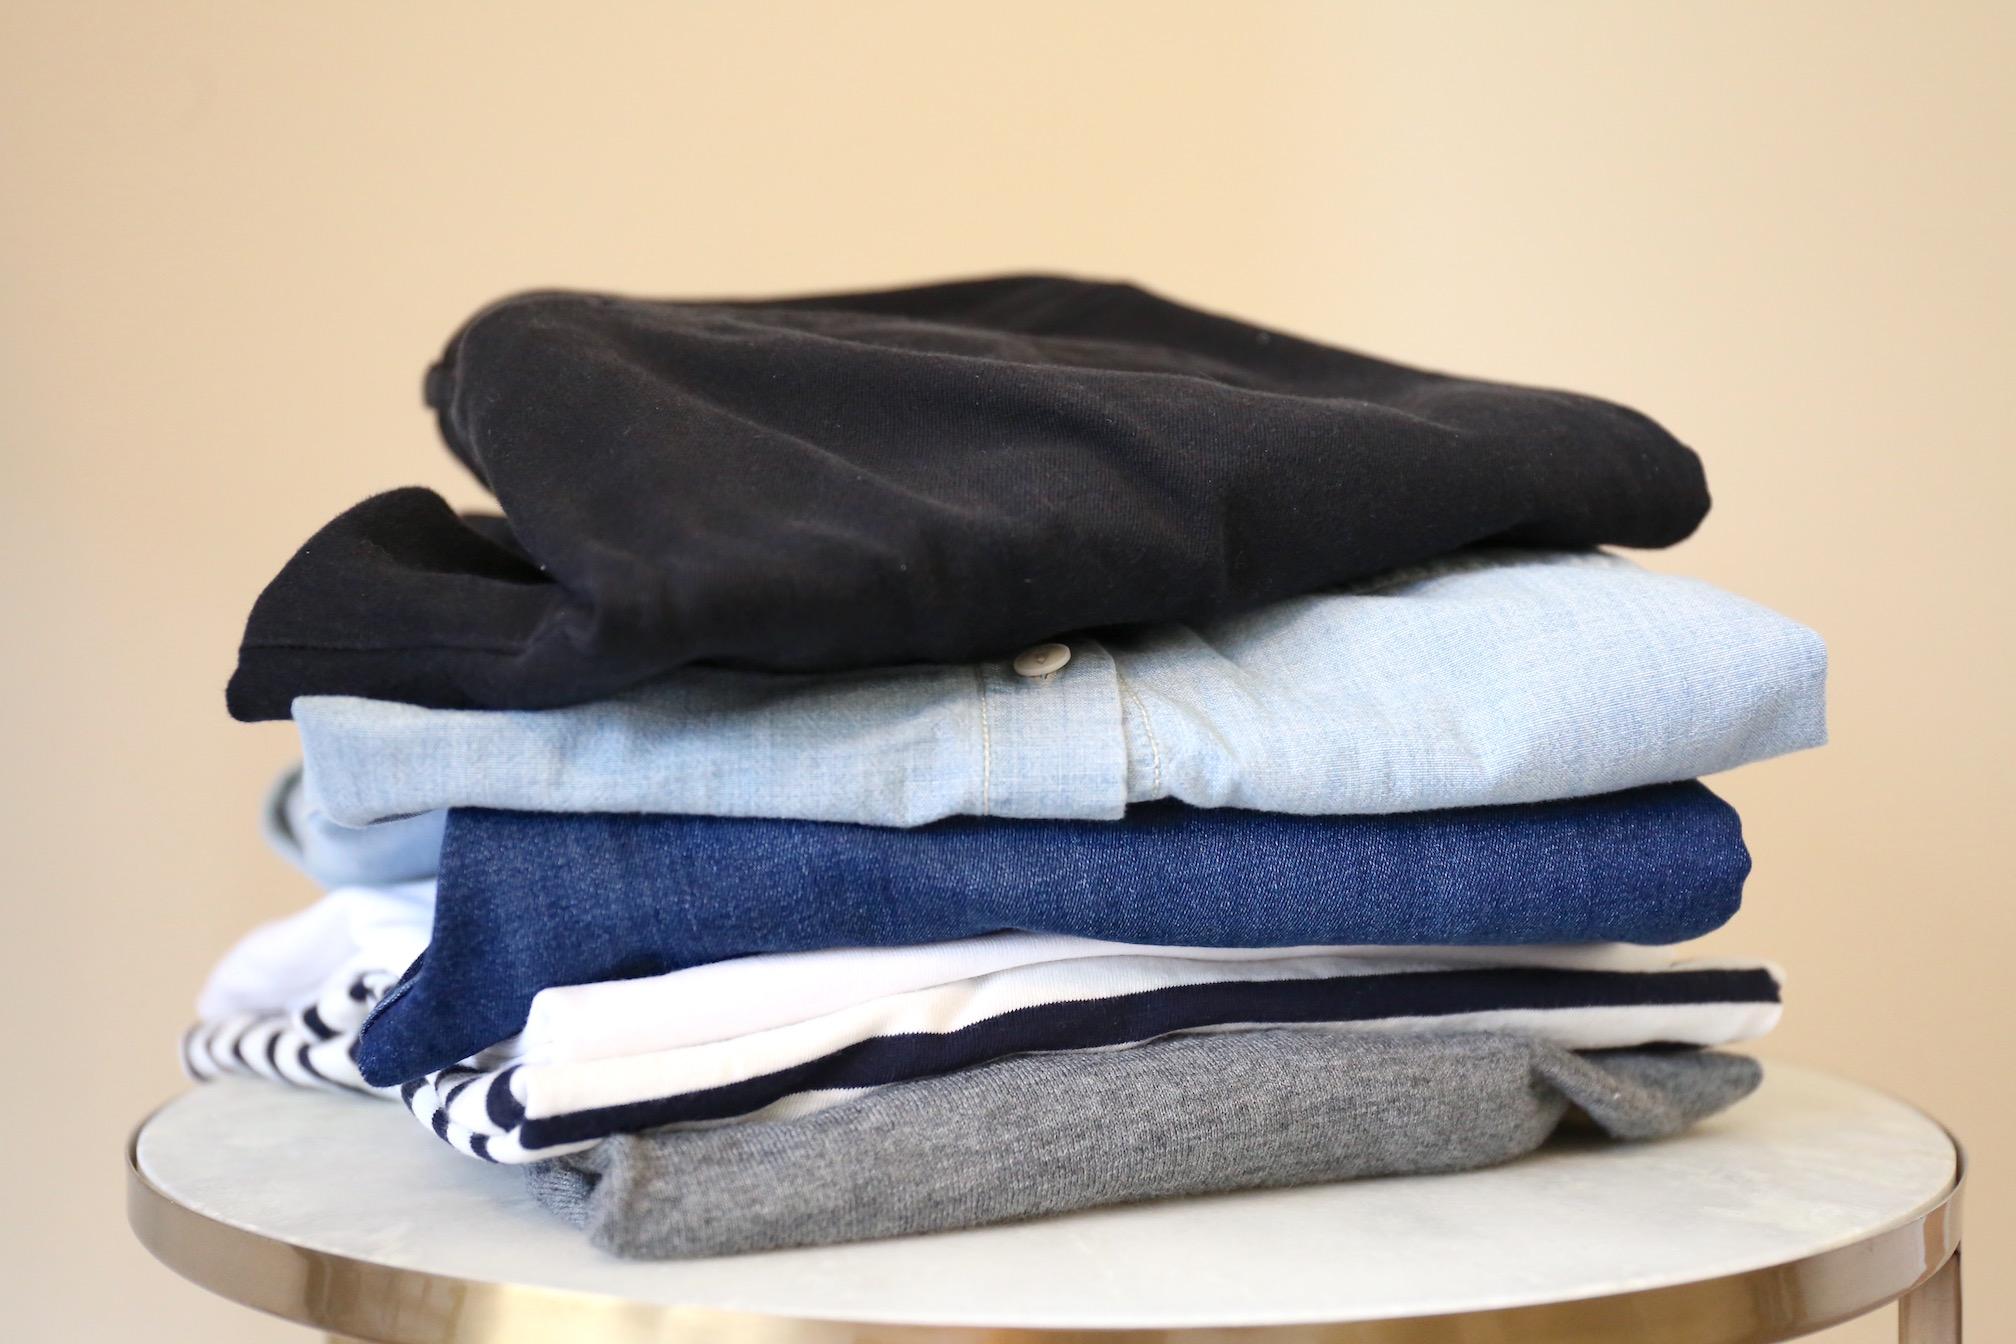 10 x 10 capsule wardrobe challenge clothes stack